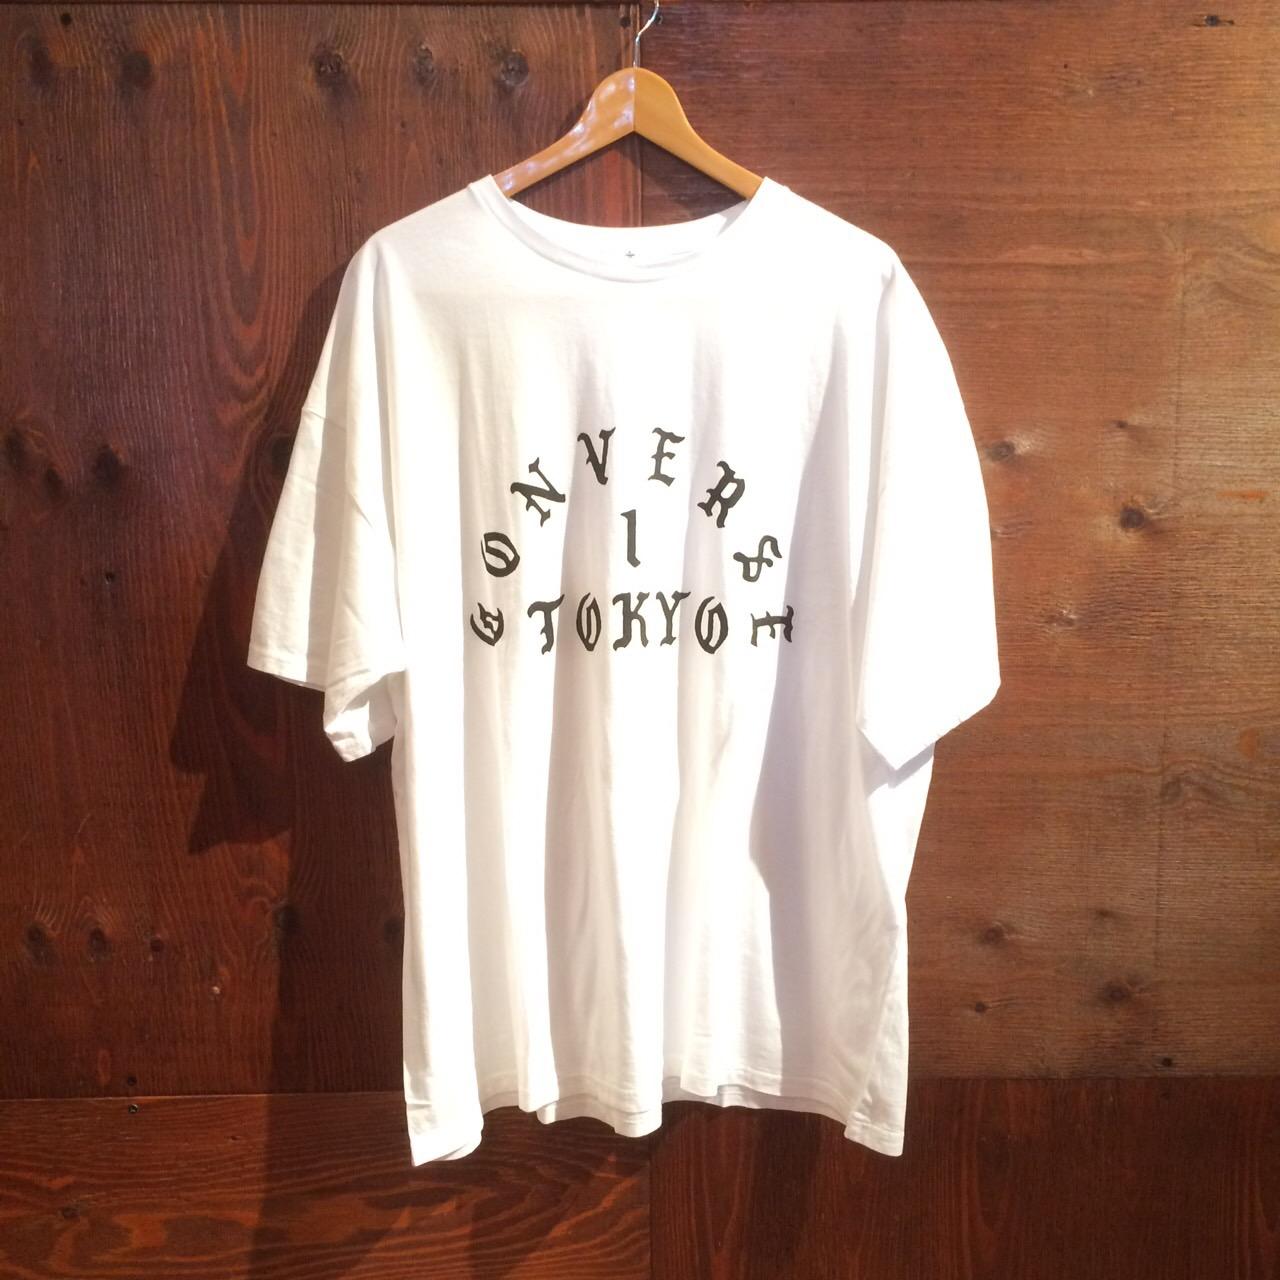 CONVERSE TOKYO ONE 2nd COLLECTION 8.19(Fri.) Start_f0020773_190833.jpg